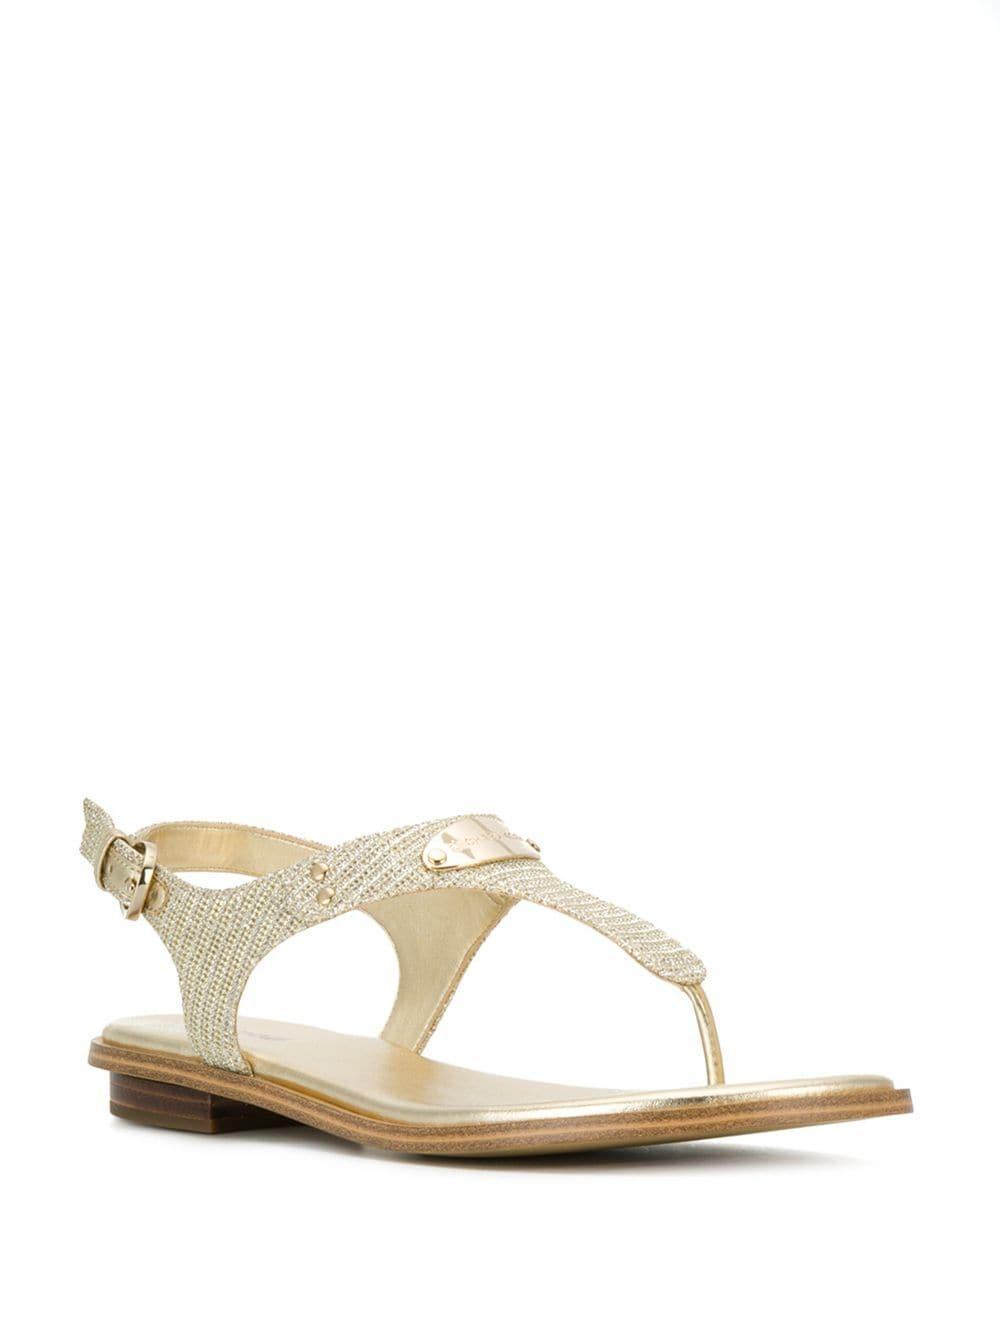 ec1ccdcd3cdb Lyst - MICHAEL Michael Kors Mk Plate Embellished Sandals in Metallic